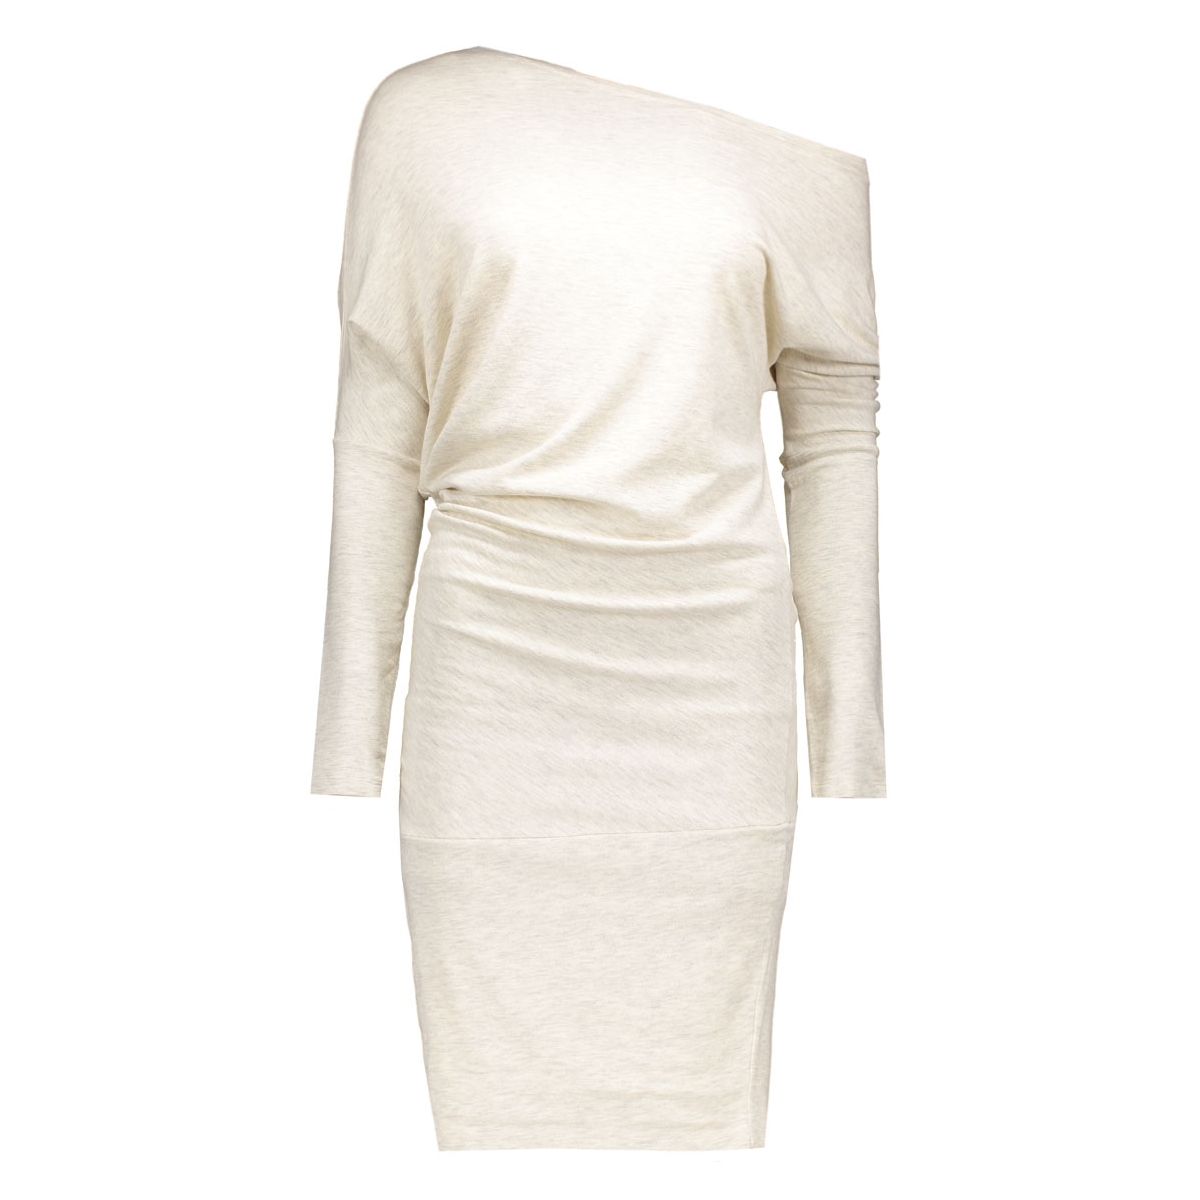 16wi334 10 days jurk 17-0117 soft white melee